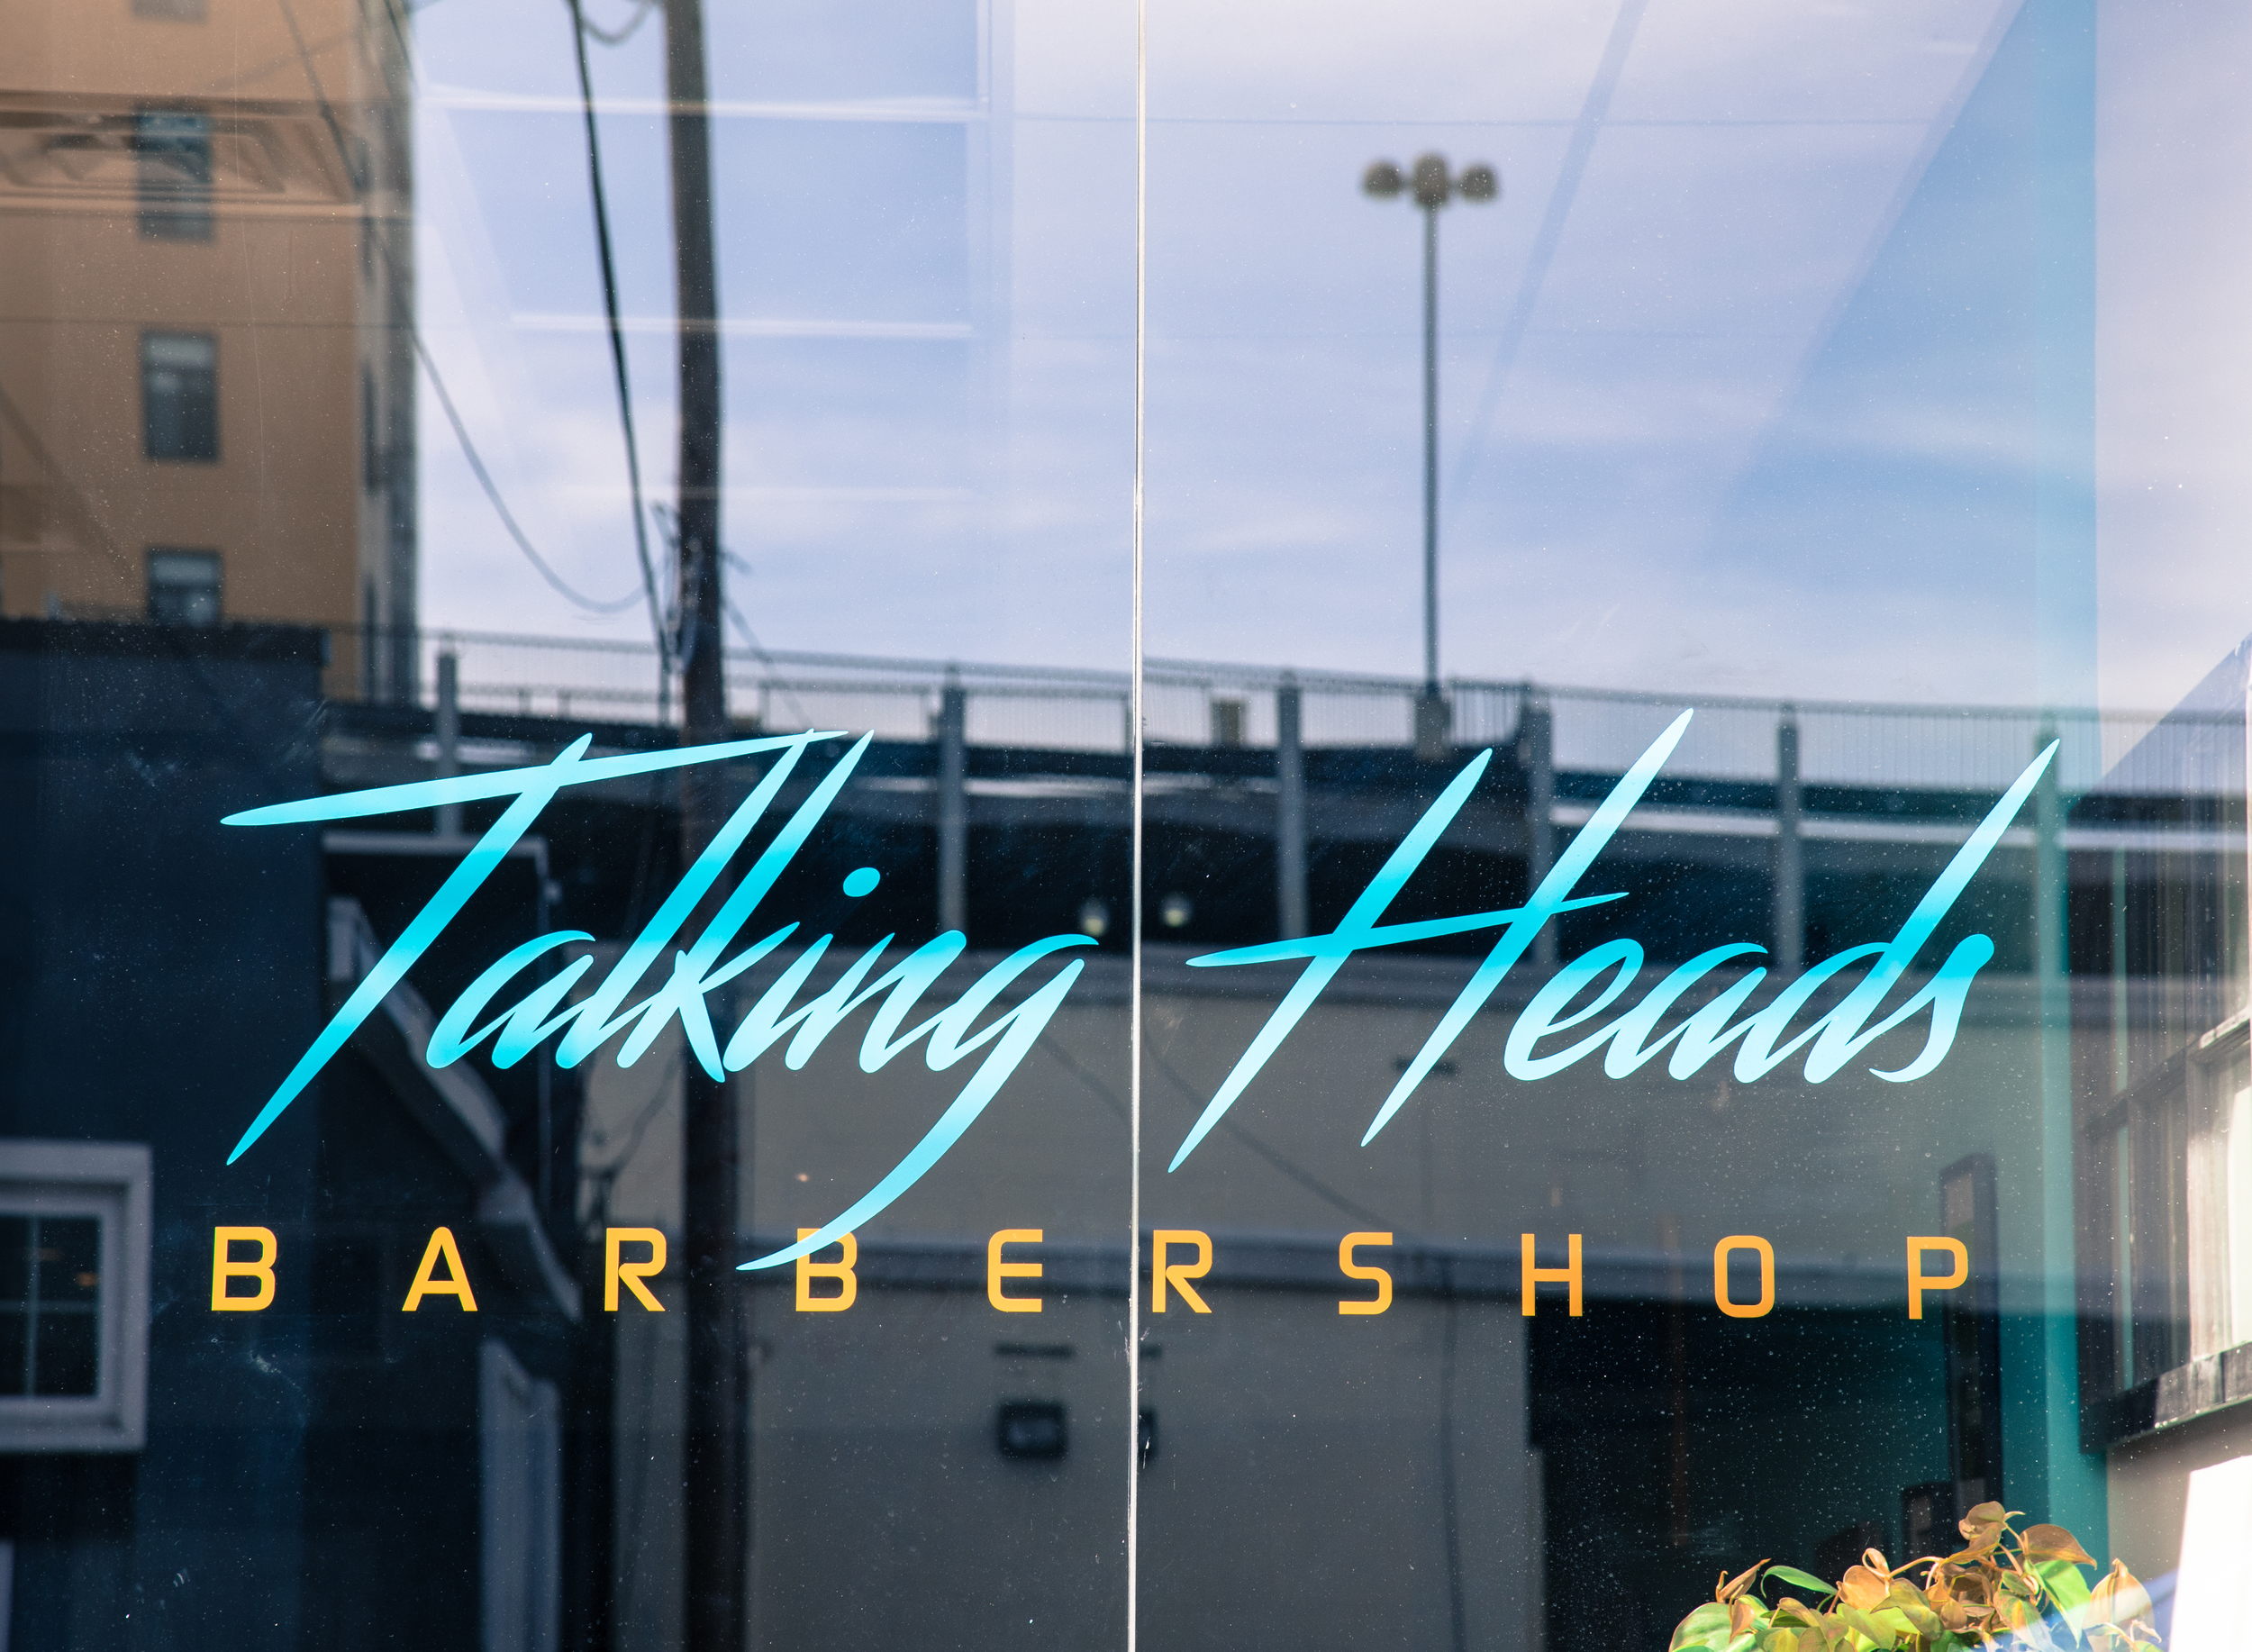 talking-heads-barber-shop-asbury-park-nj-3.jpg